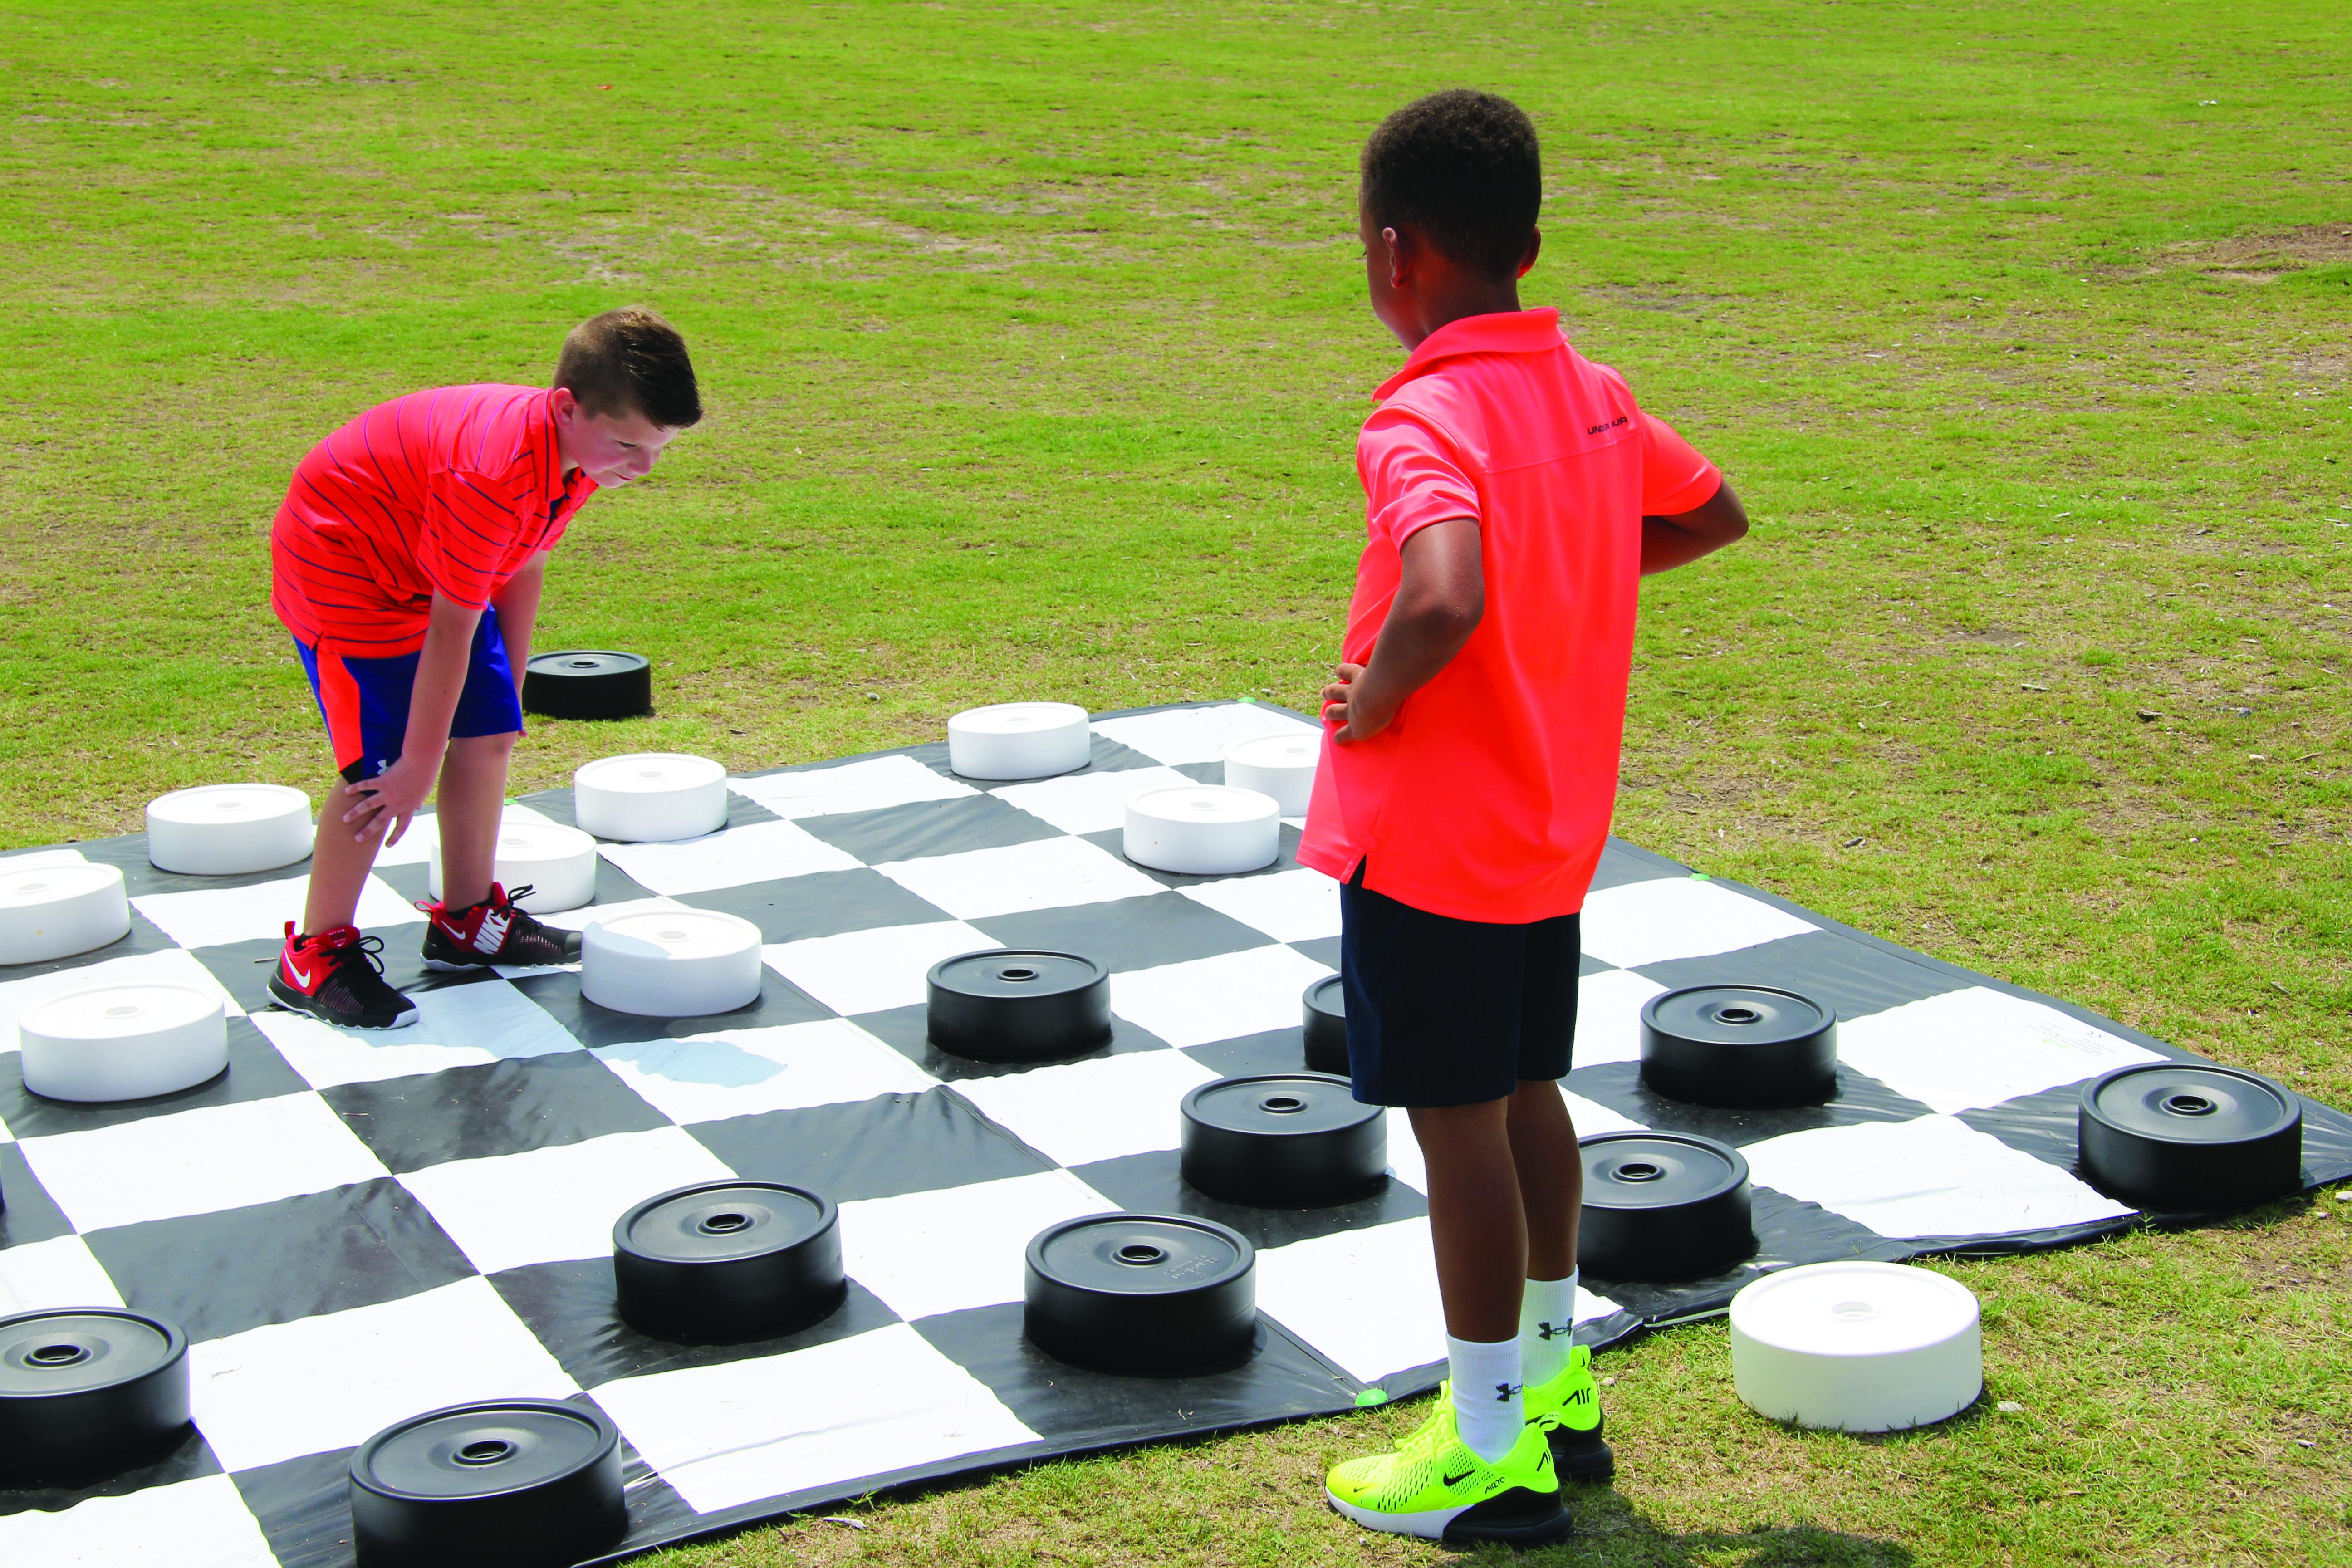 kids taking a brain break to play checkers outside